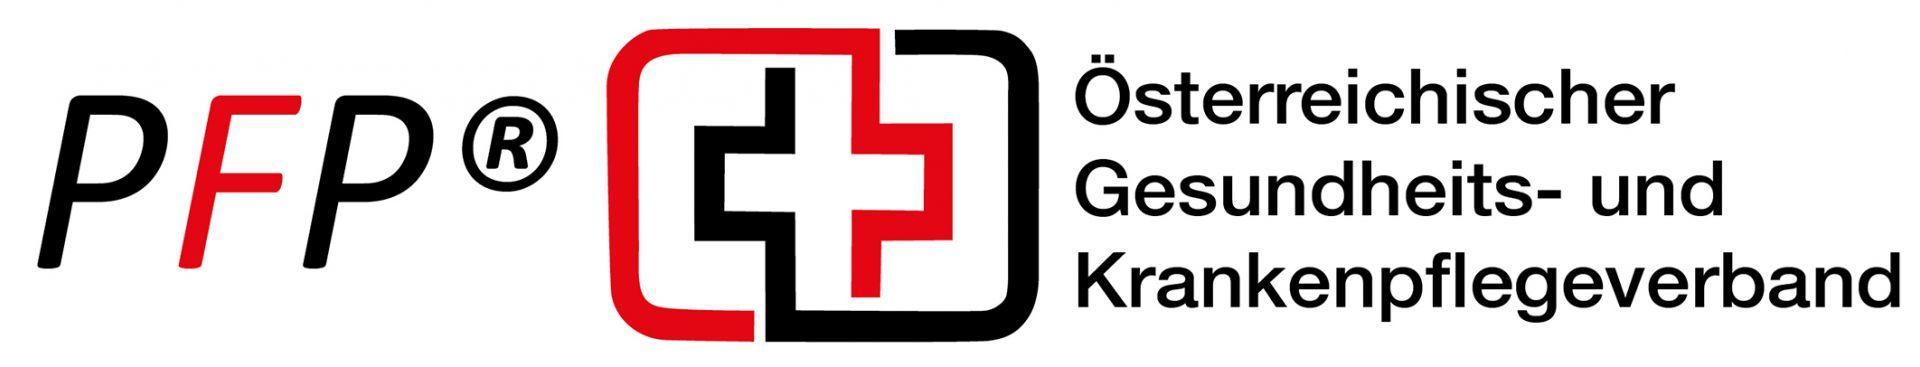 PFP-Logo_OEGKV-300dpi